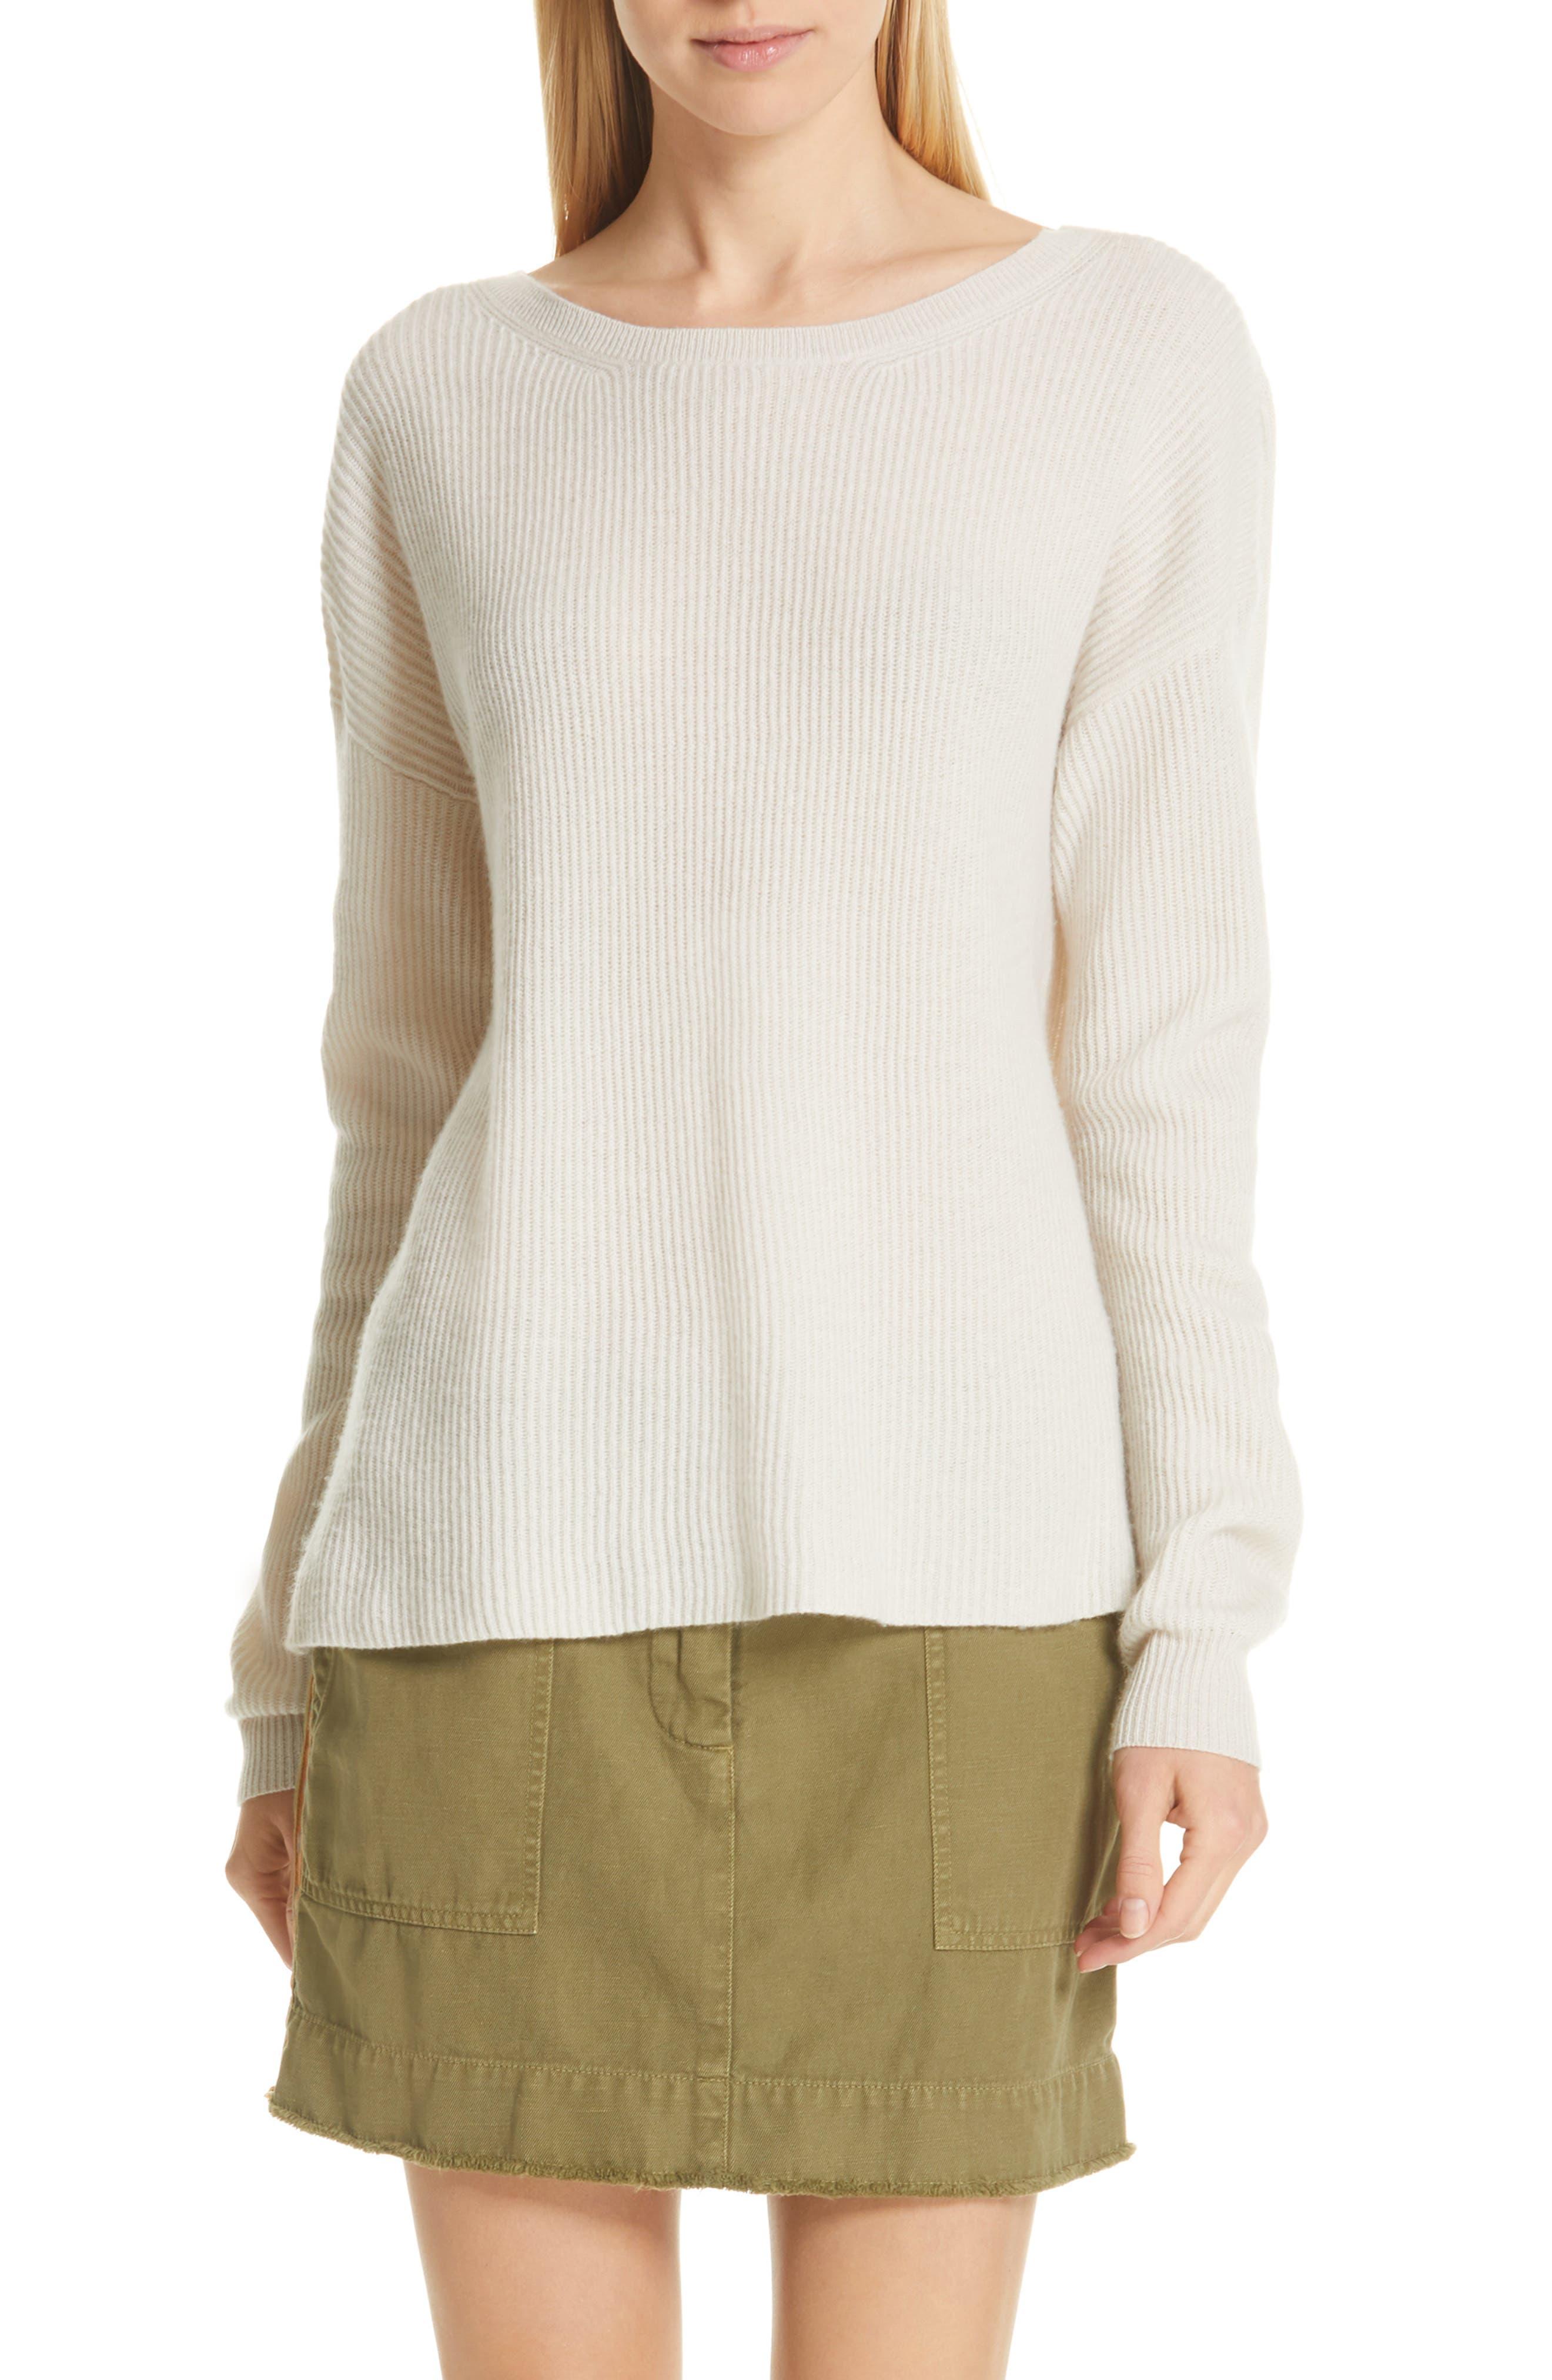 NILI LOTAN Hadis Cashmere Sweater, Main, color, IVORY